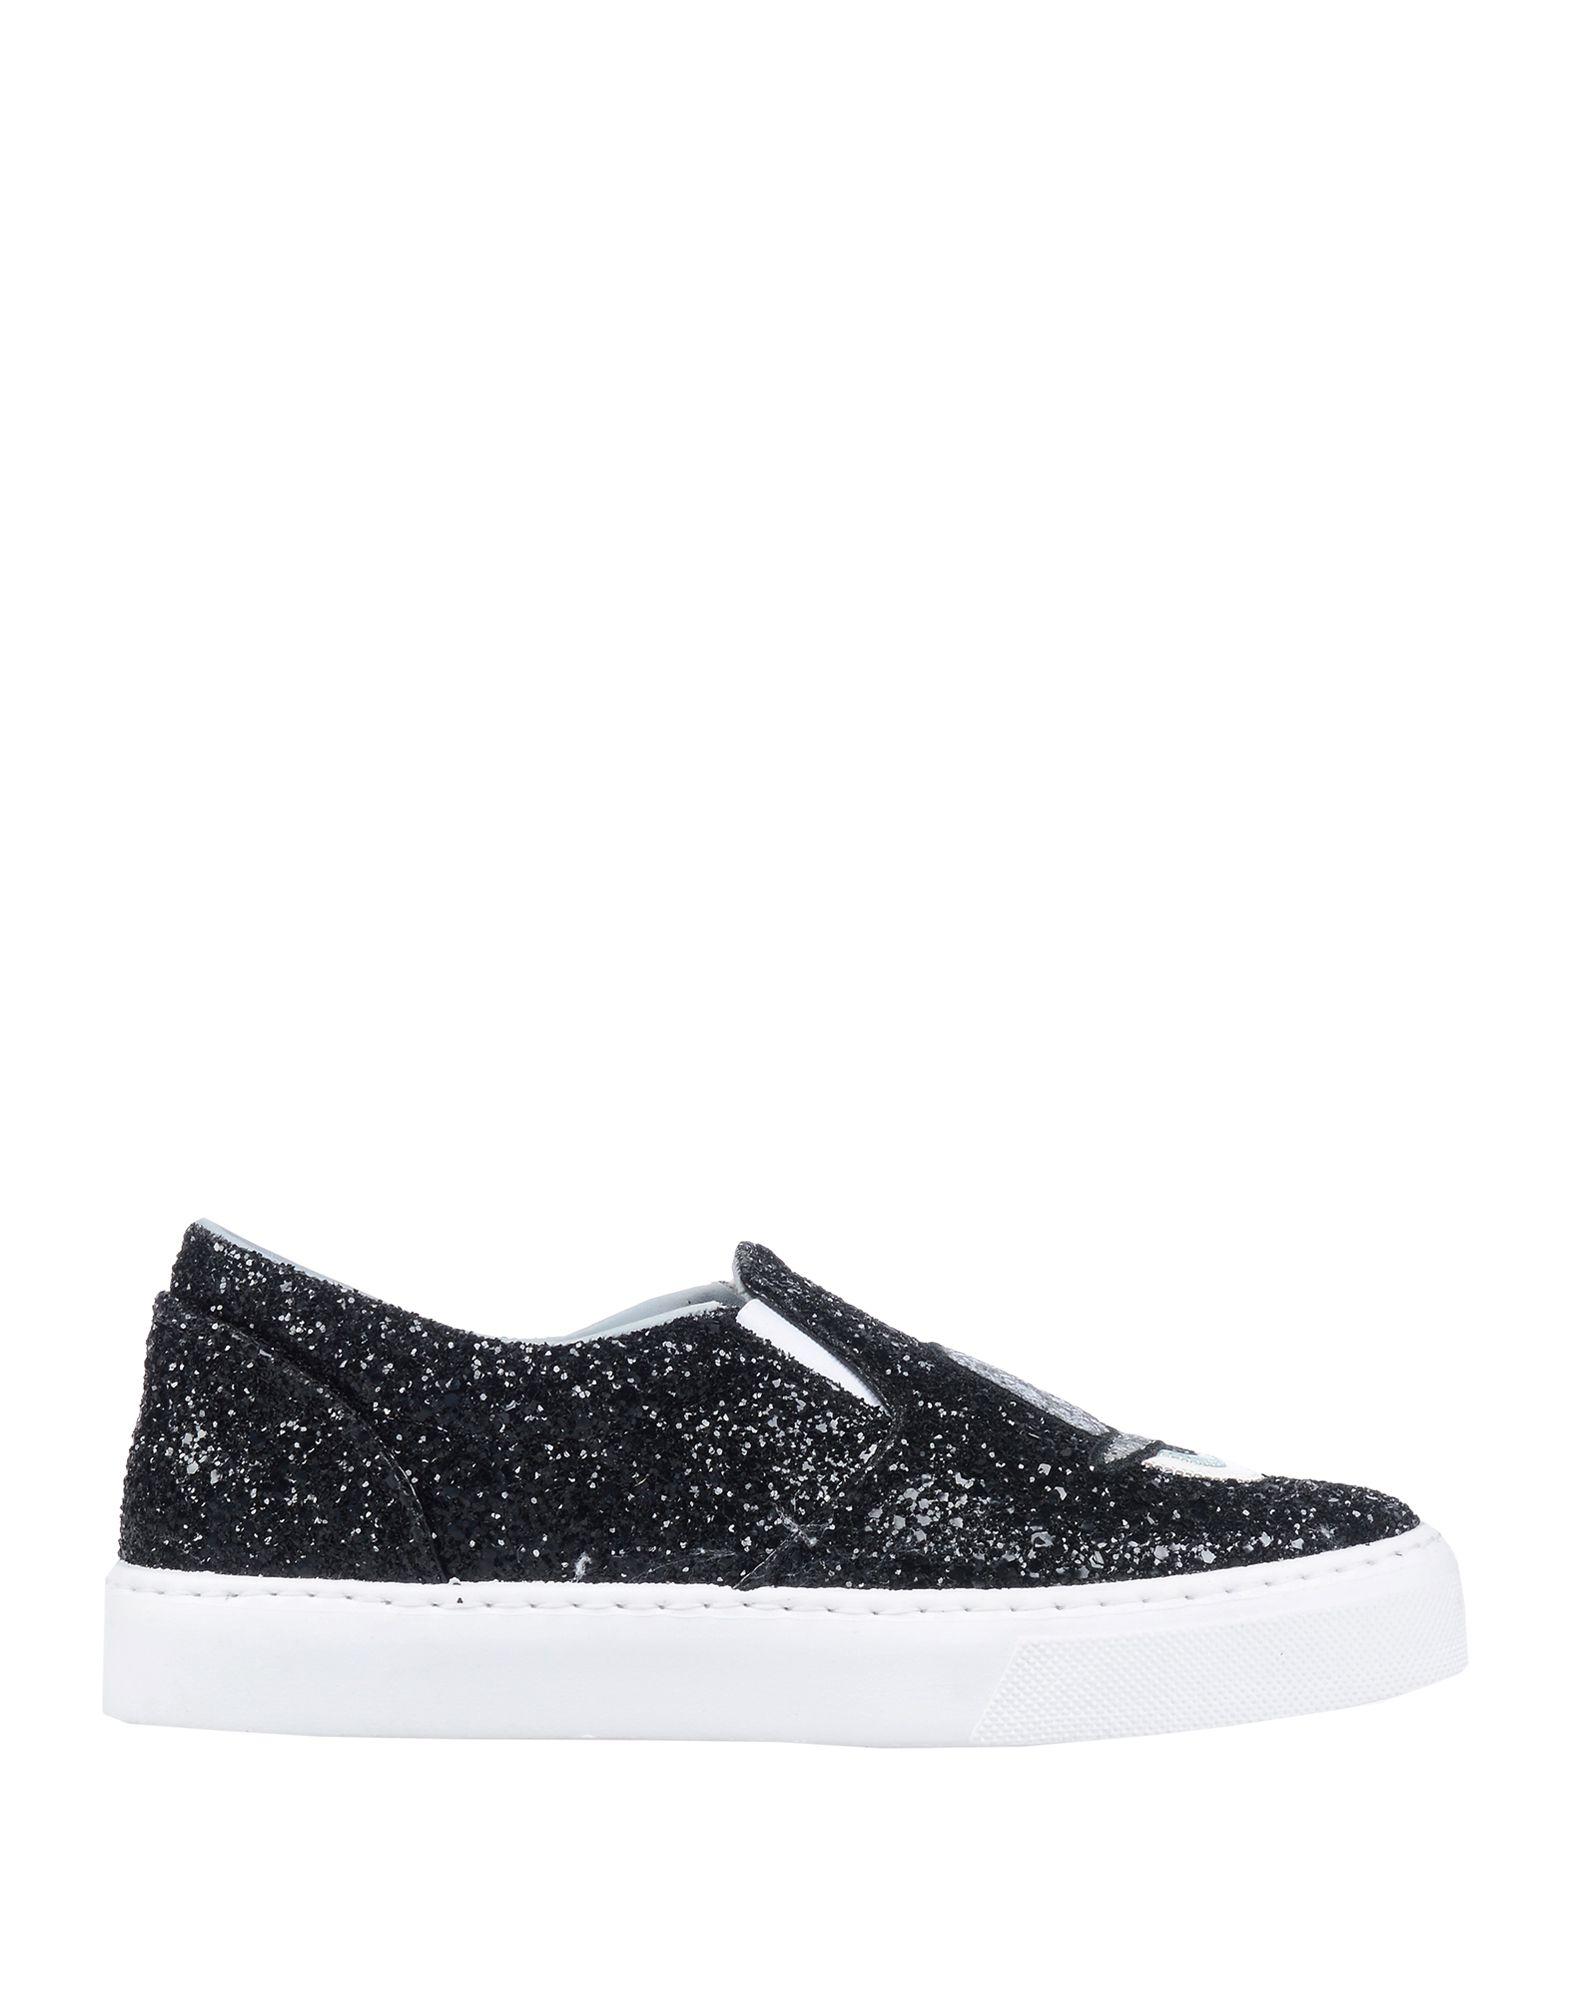 Stilvolle billige Schuhe Chiara 11493493VP Ferragni Sneakers Damen  11493493VP Chiara 4db739